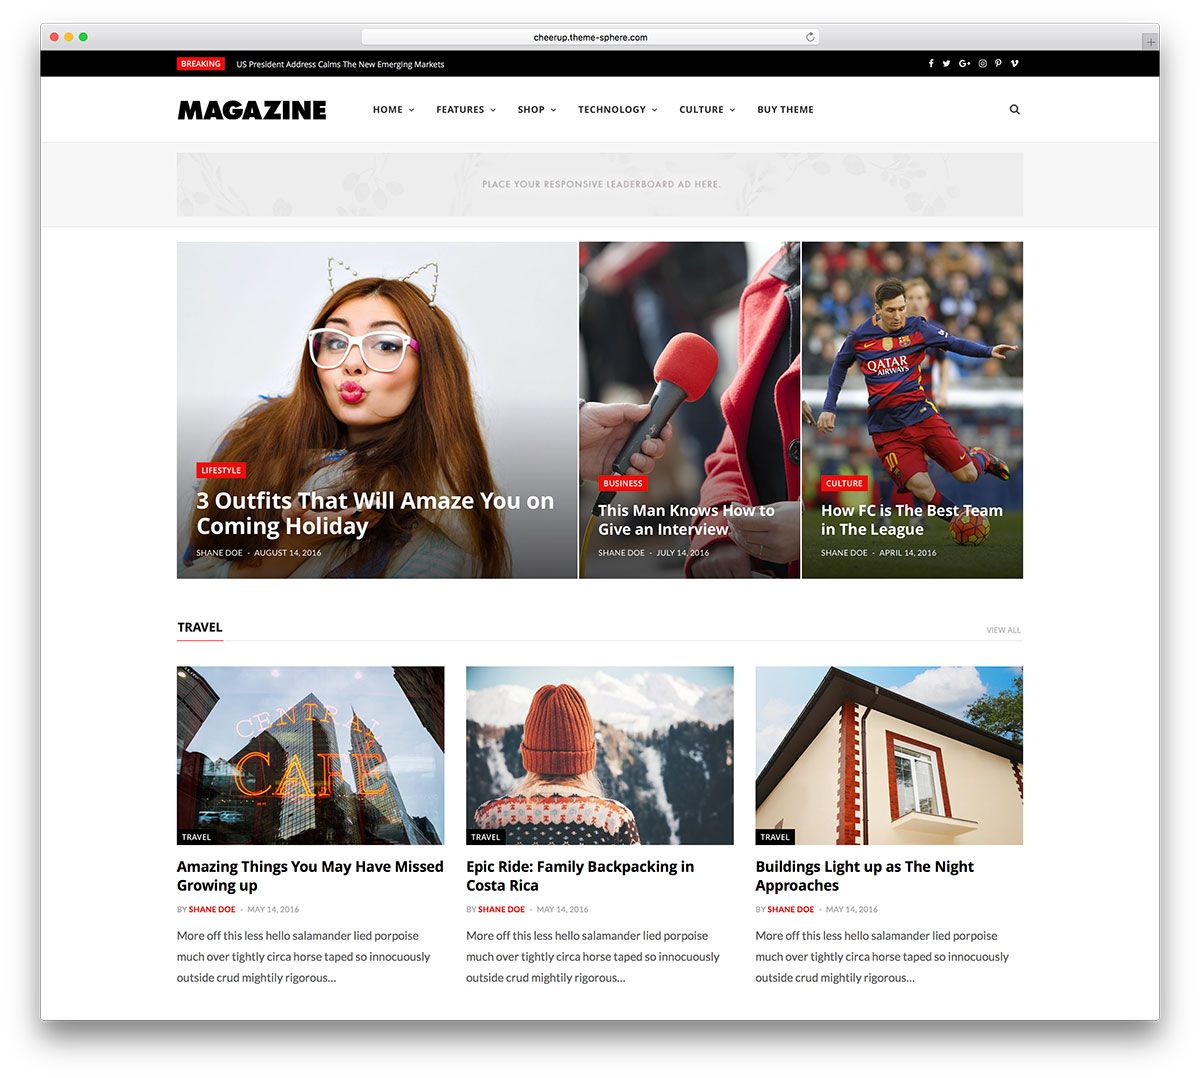 26 Best Adsense Optimized Wordpress Themes